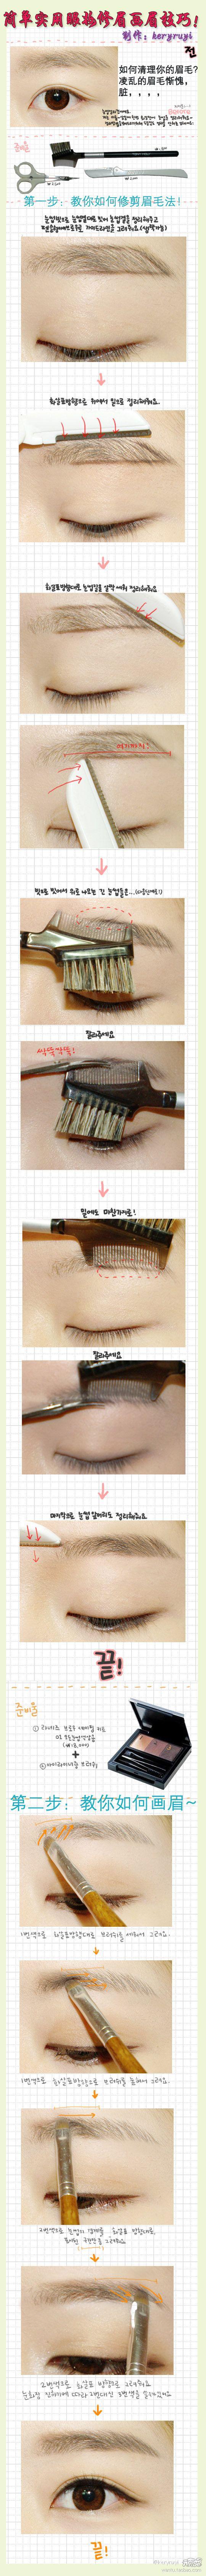 korean eyebrow tutorial.